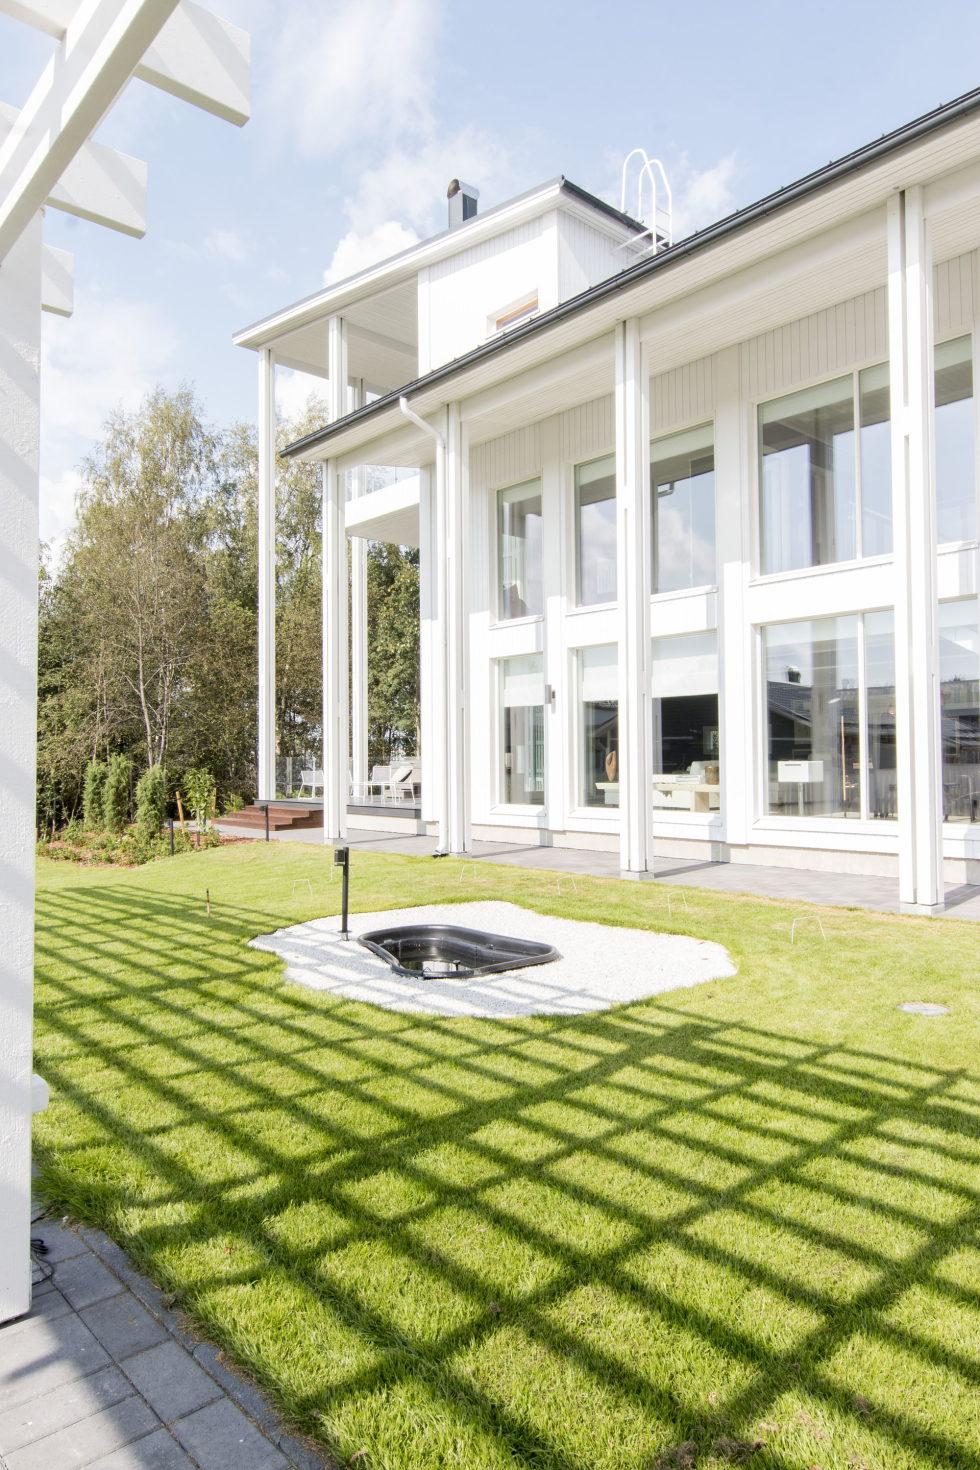 Muurame The Wooden Villa On The Lake Shore In Finland 7